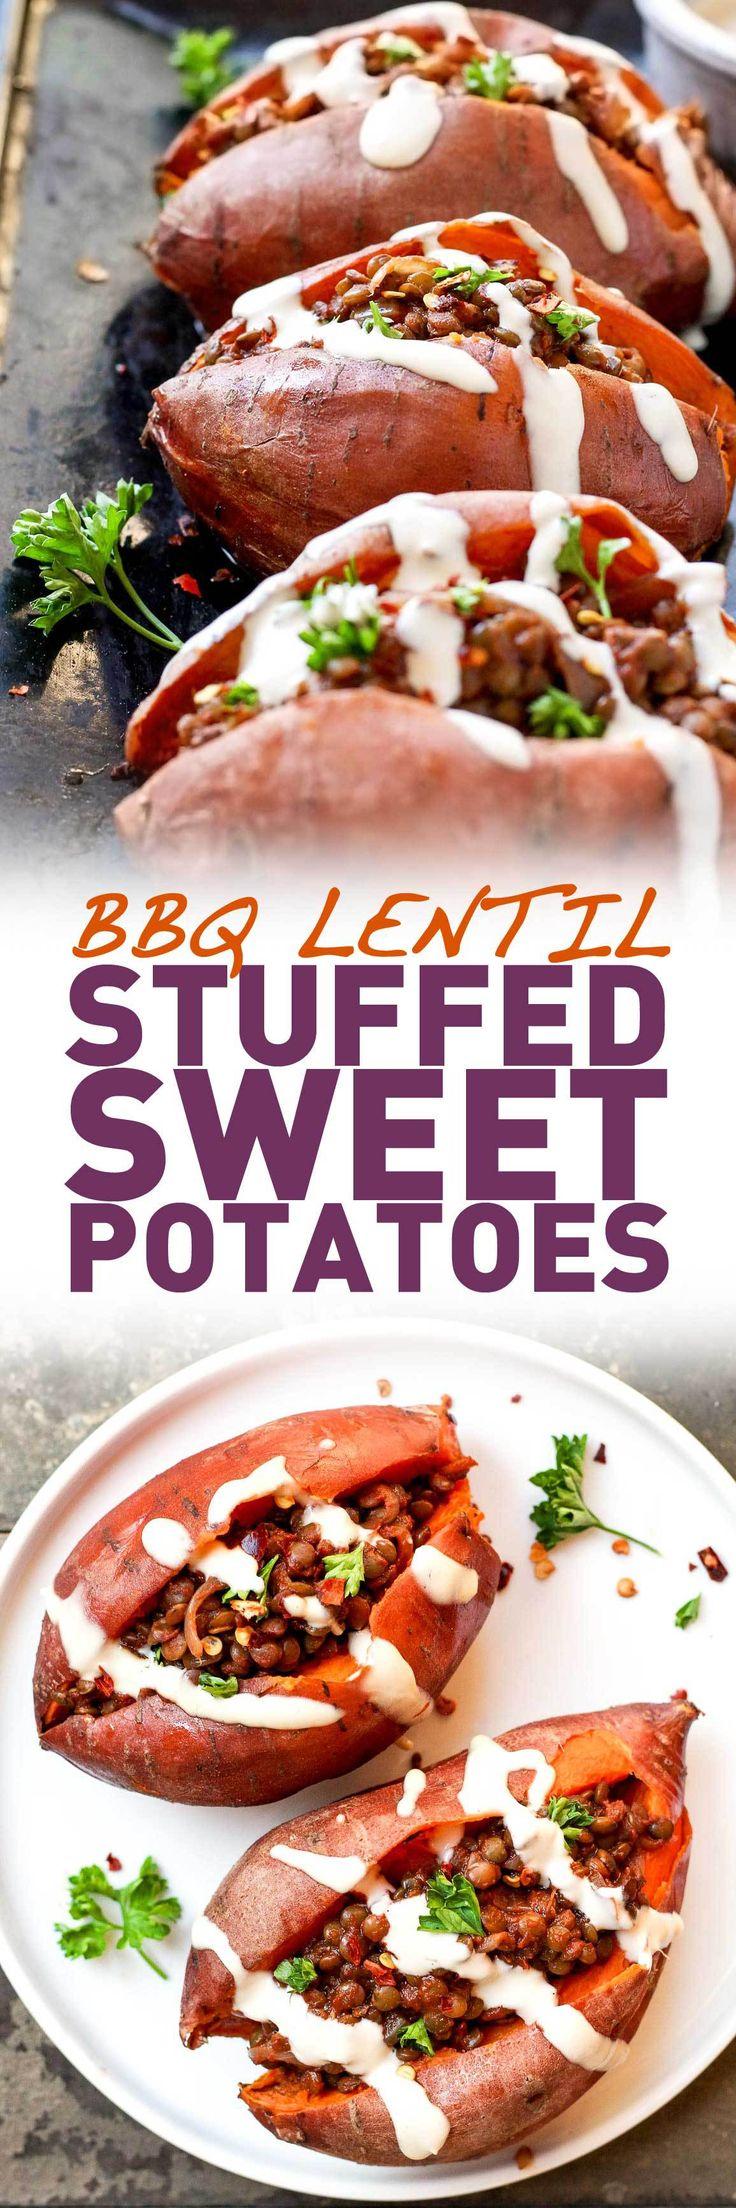 BBQ Lentil Stuffed Sweet Potatoes (use fire roasted tomatoes!)